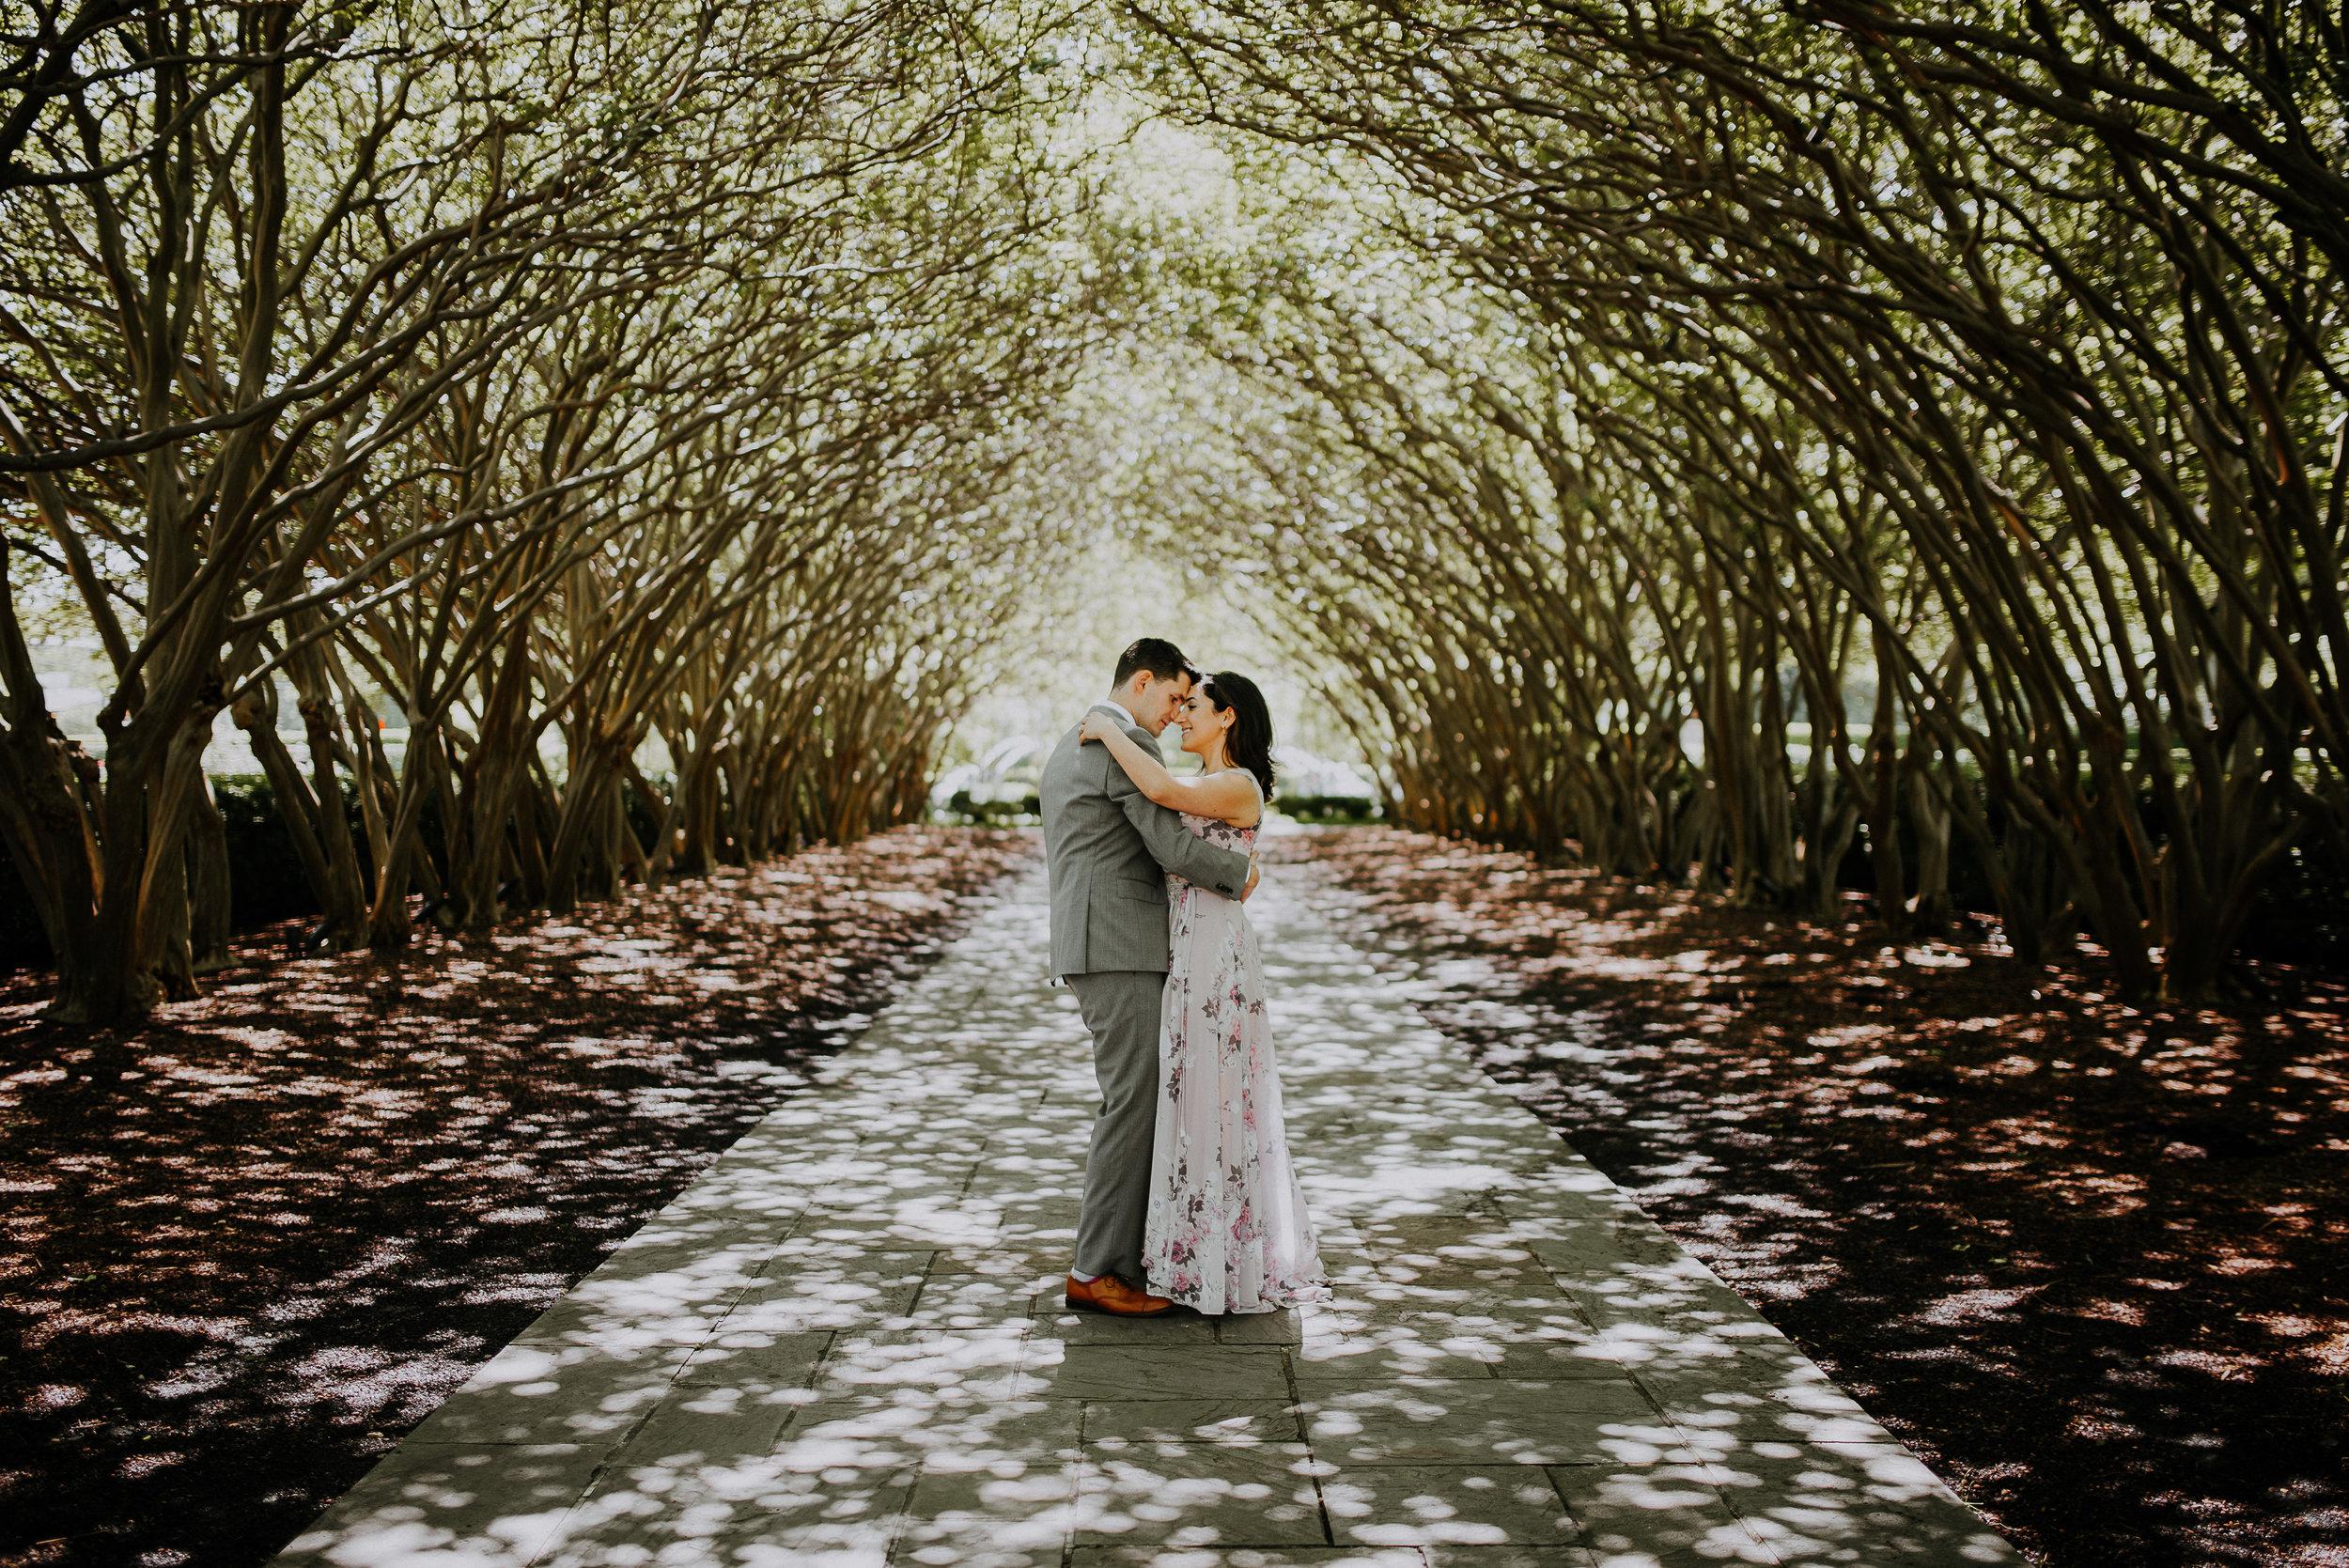 dallas-fort-worth-wedding-photographer-intimate-wedding-dallas-arboretum-01